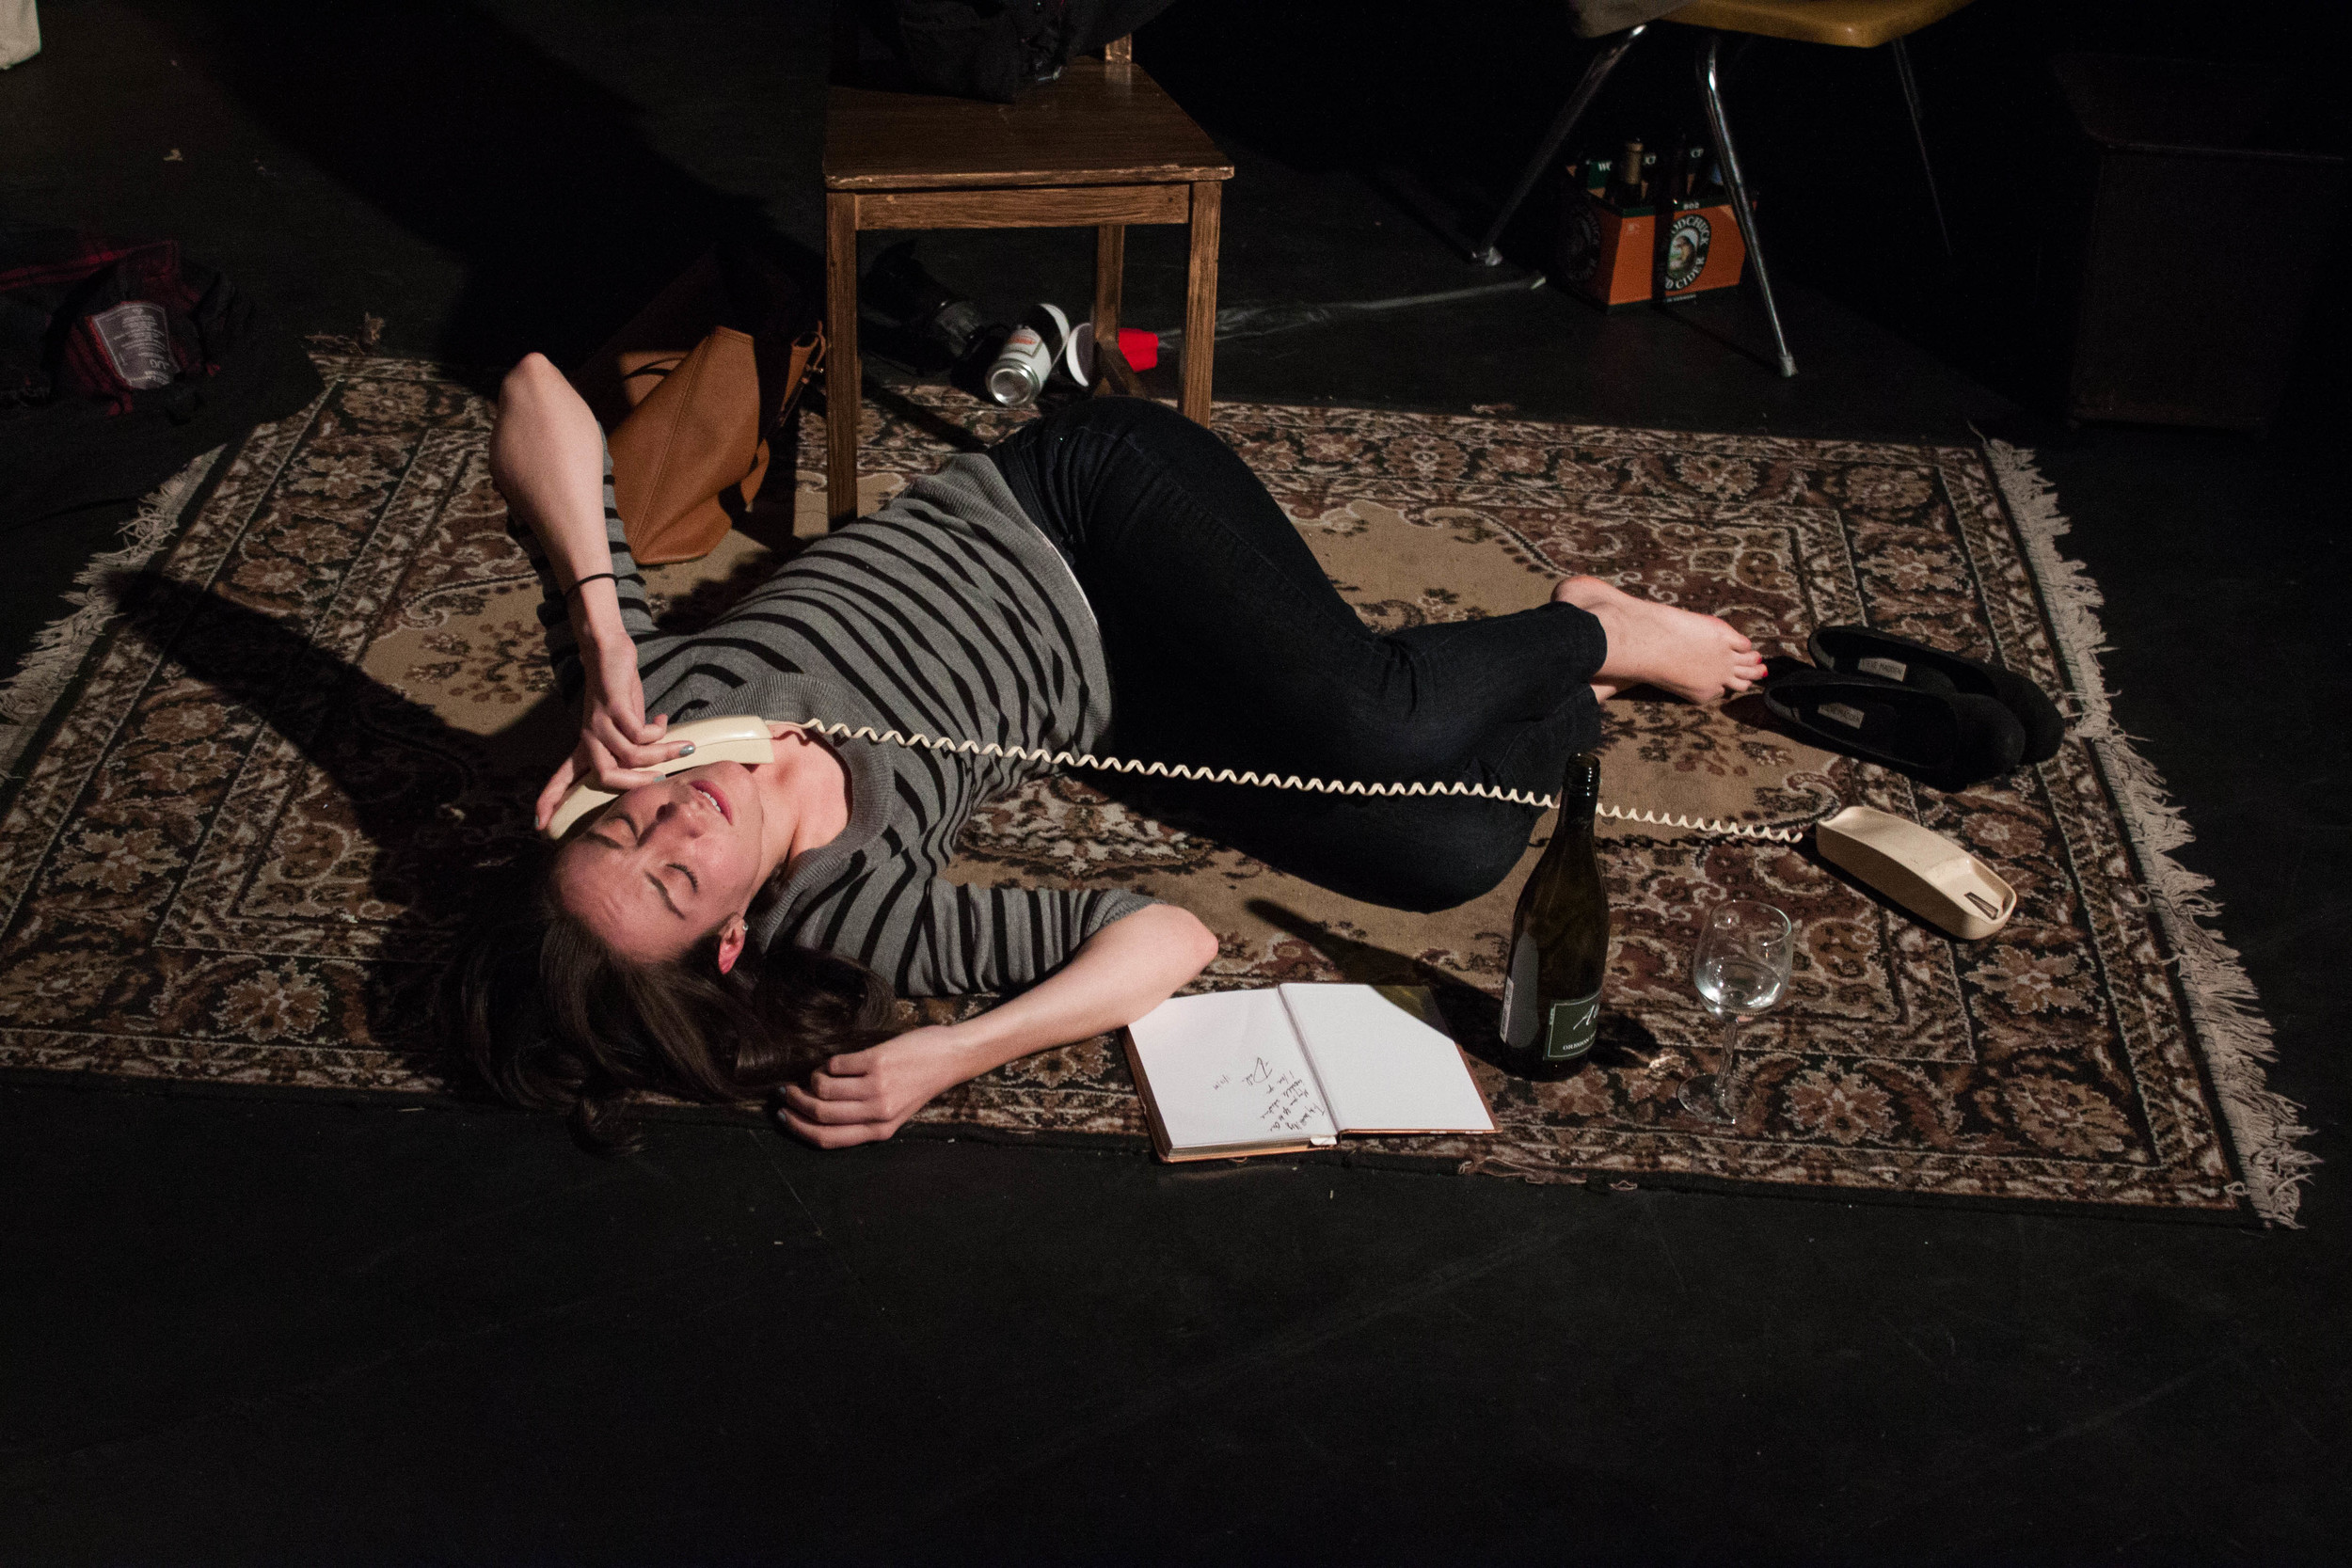 Meg's drunk dial to Cameron